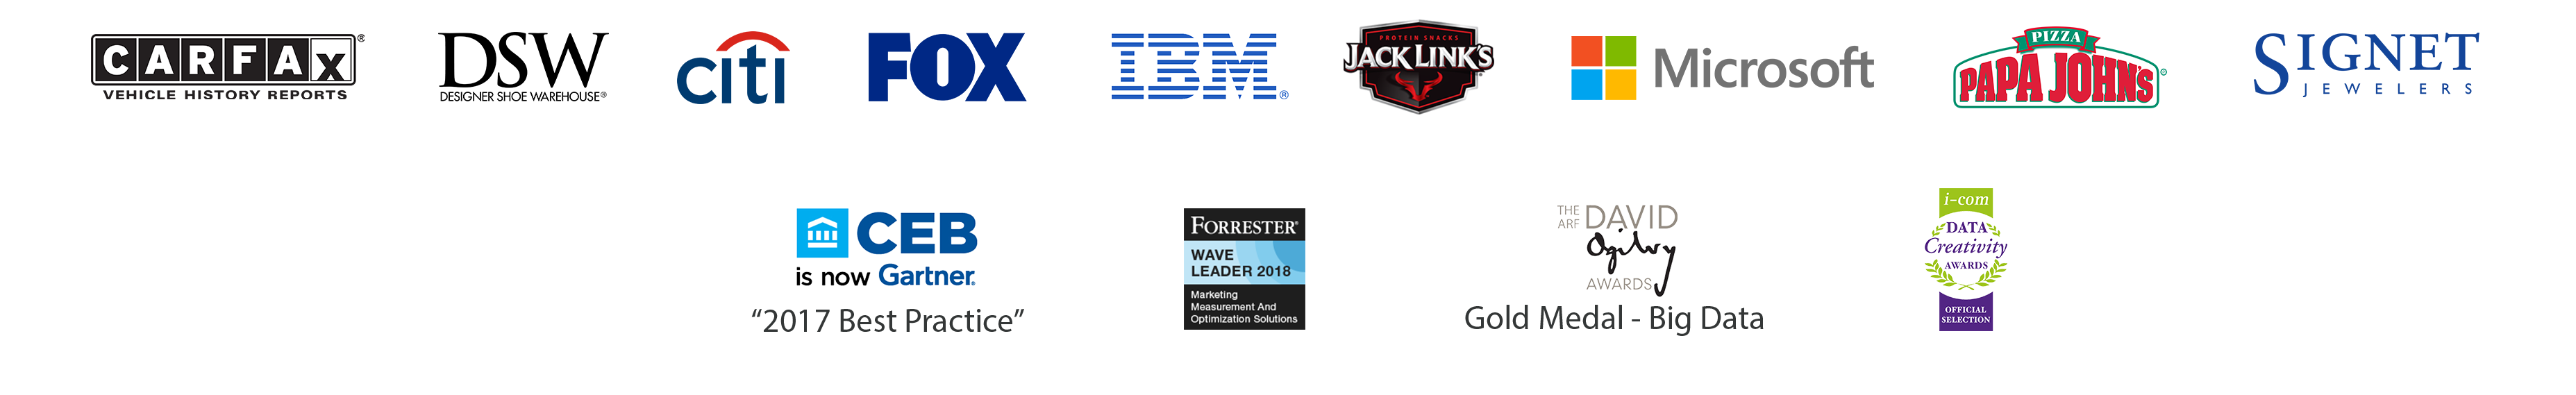 logos and awards.png